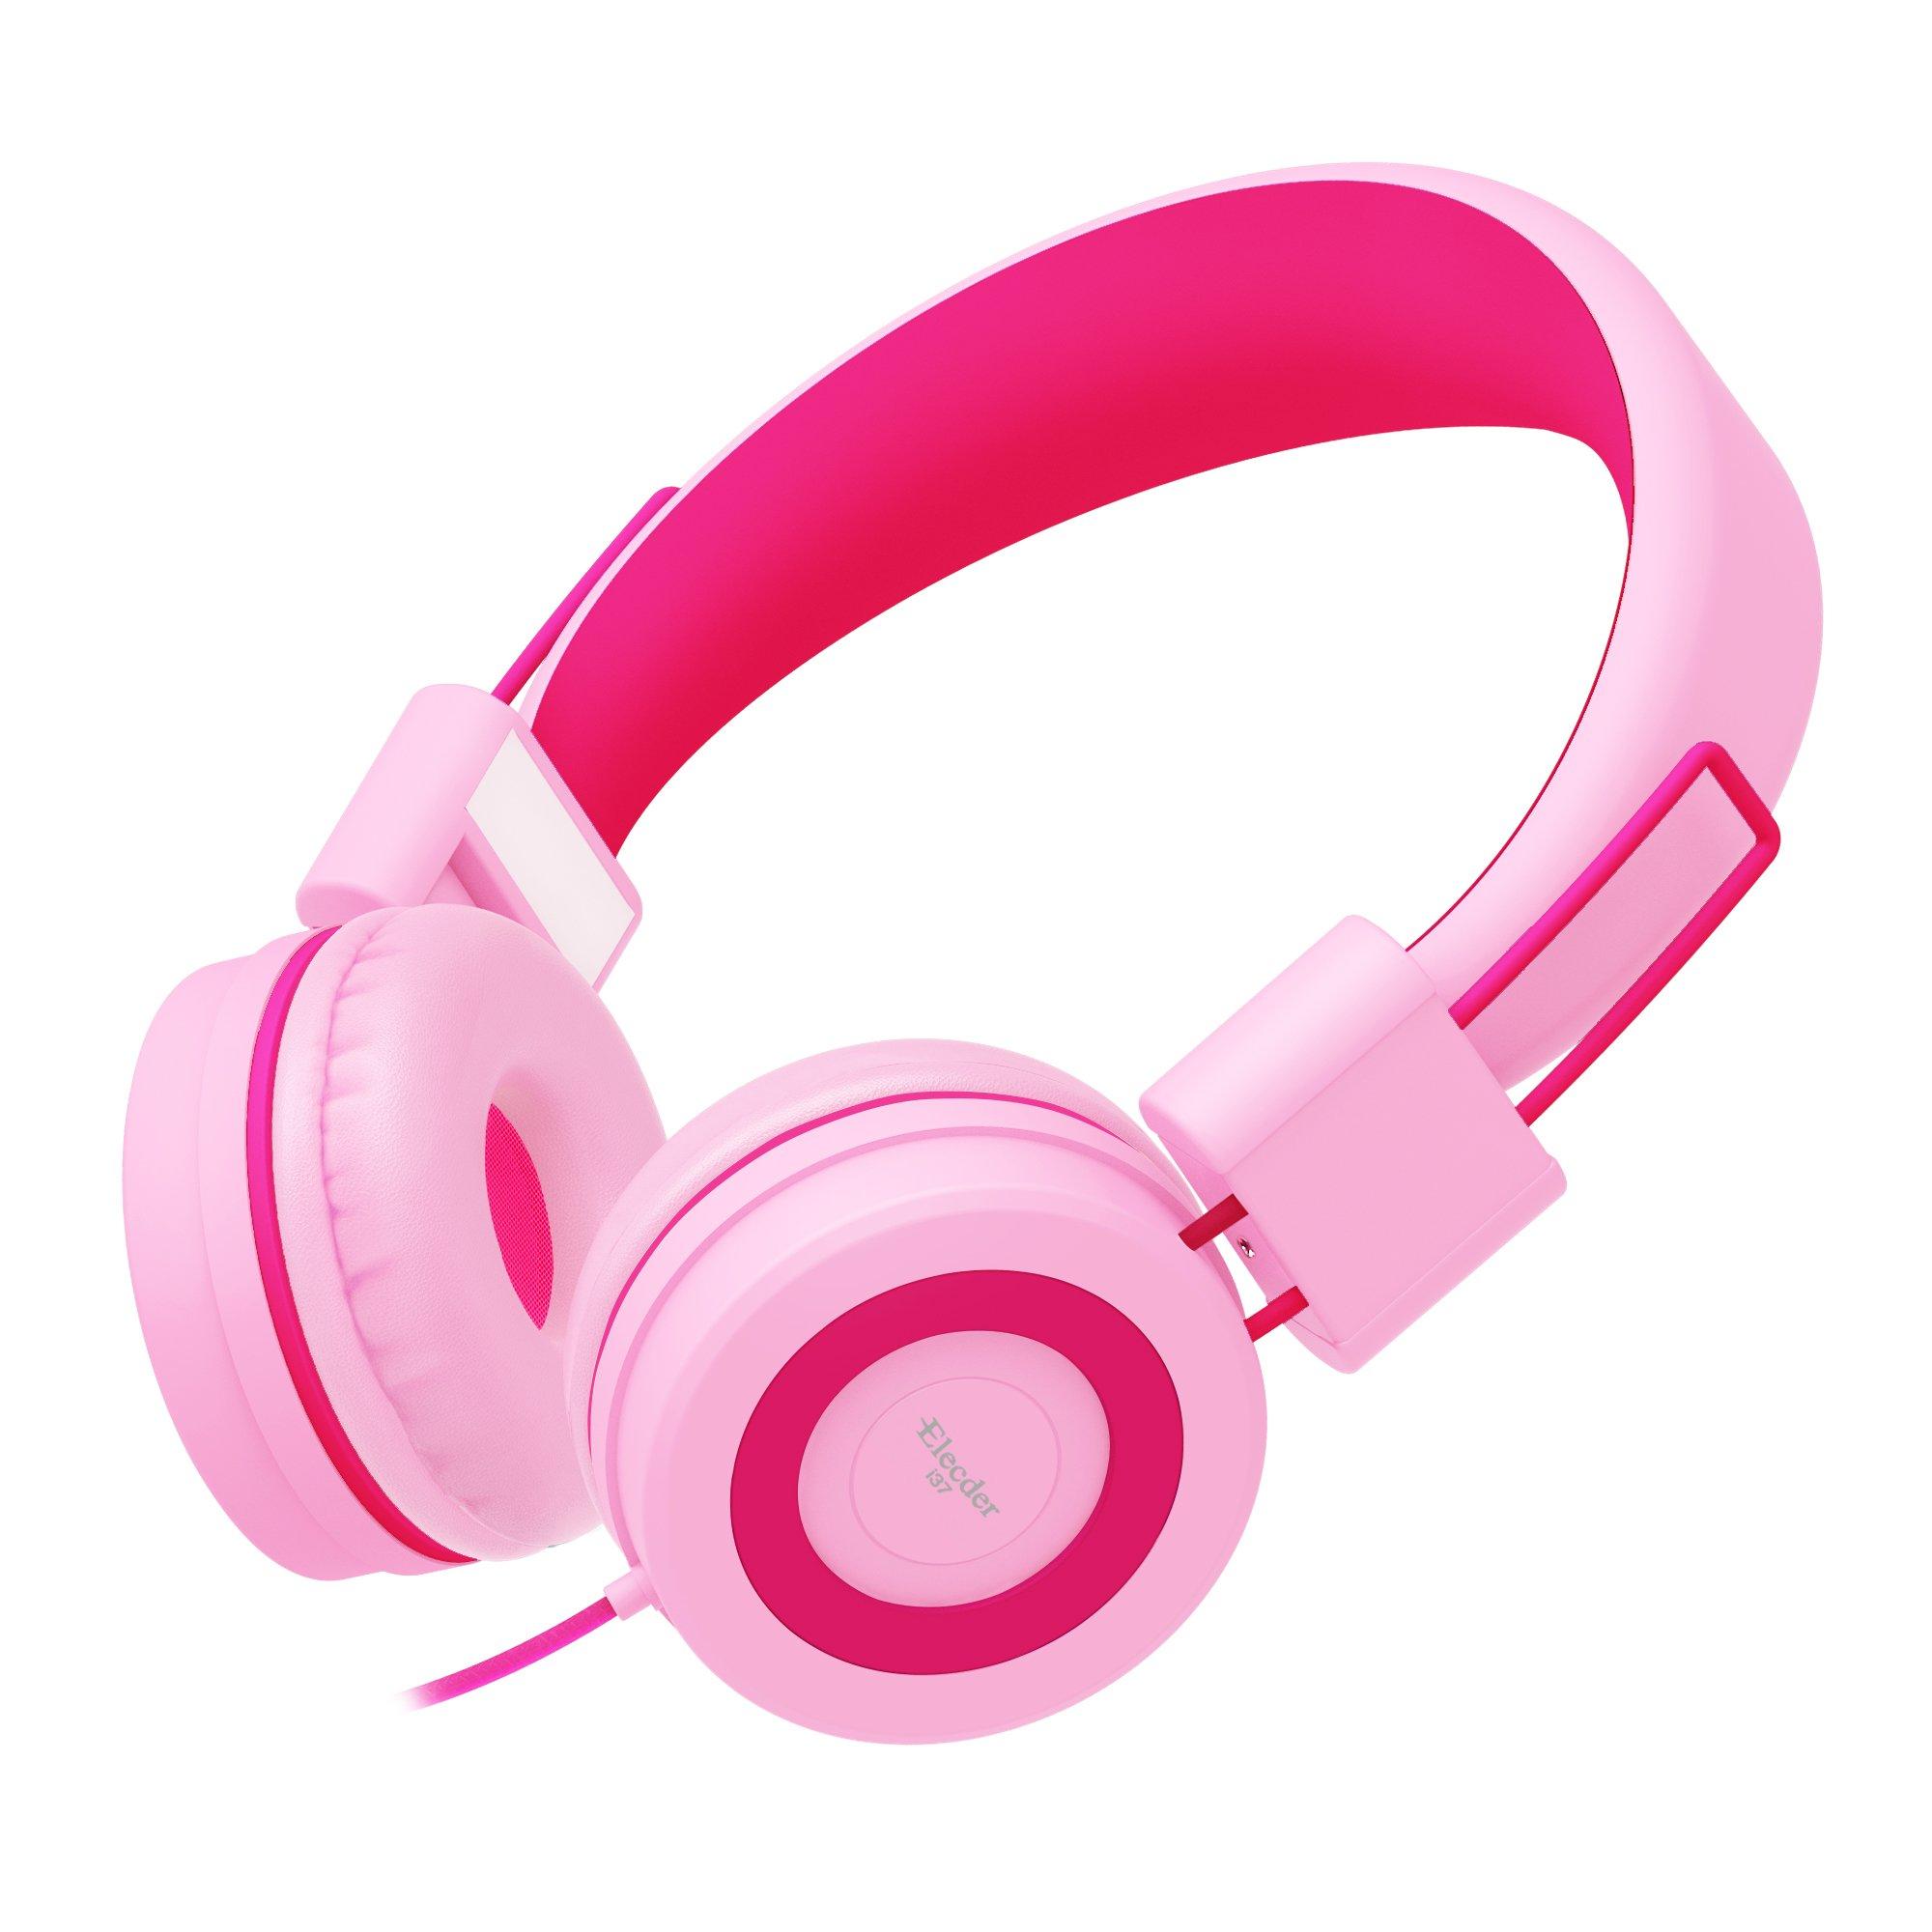 Elecder i37 Kids Headphones Children Girls Boys Teens Foldable Adjustable On Ear Headsets 3.5mm Jack Compatible iPad Cellphones Computer MP3/4 Kindle Airplane School Tablet Rose/Pink